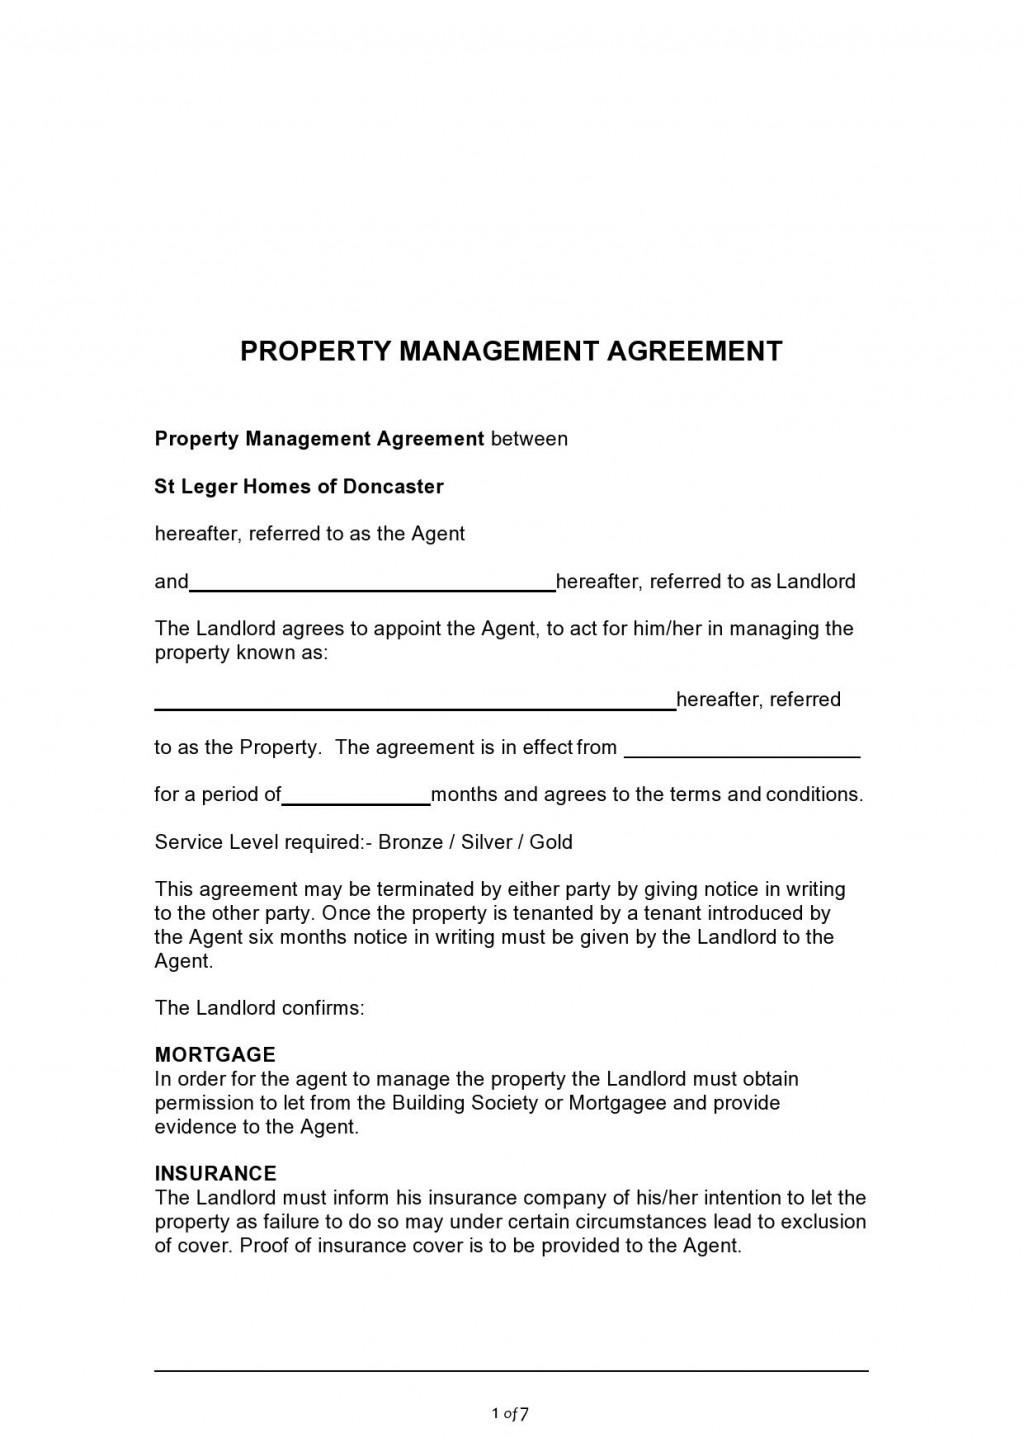 003 Impressive Commercial Property Management Agreement Template Uk Inspiration Large